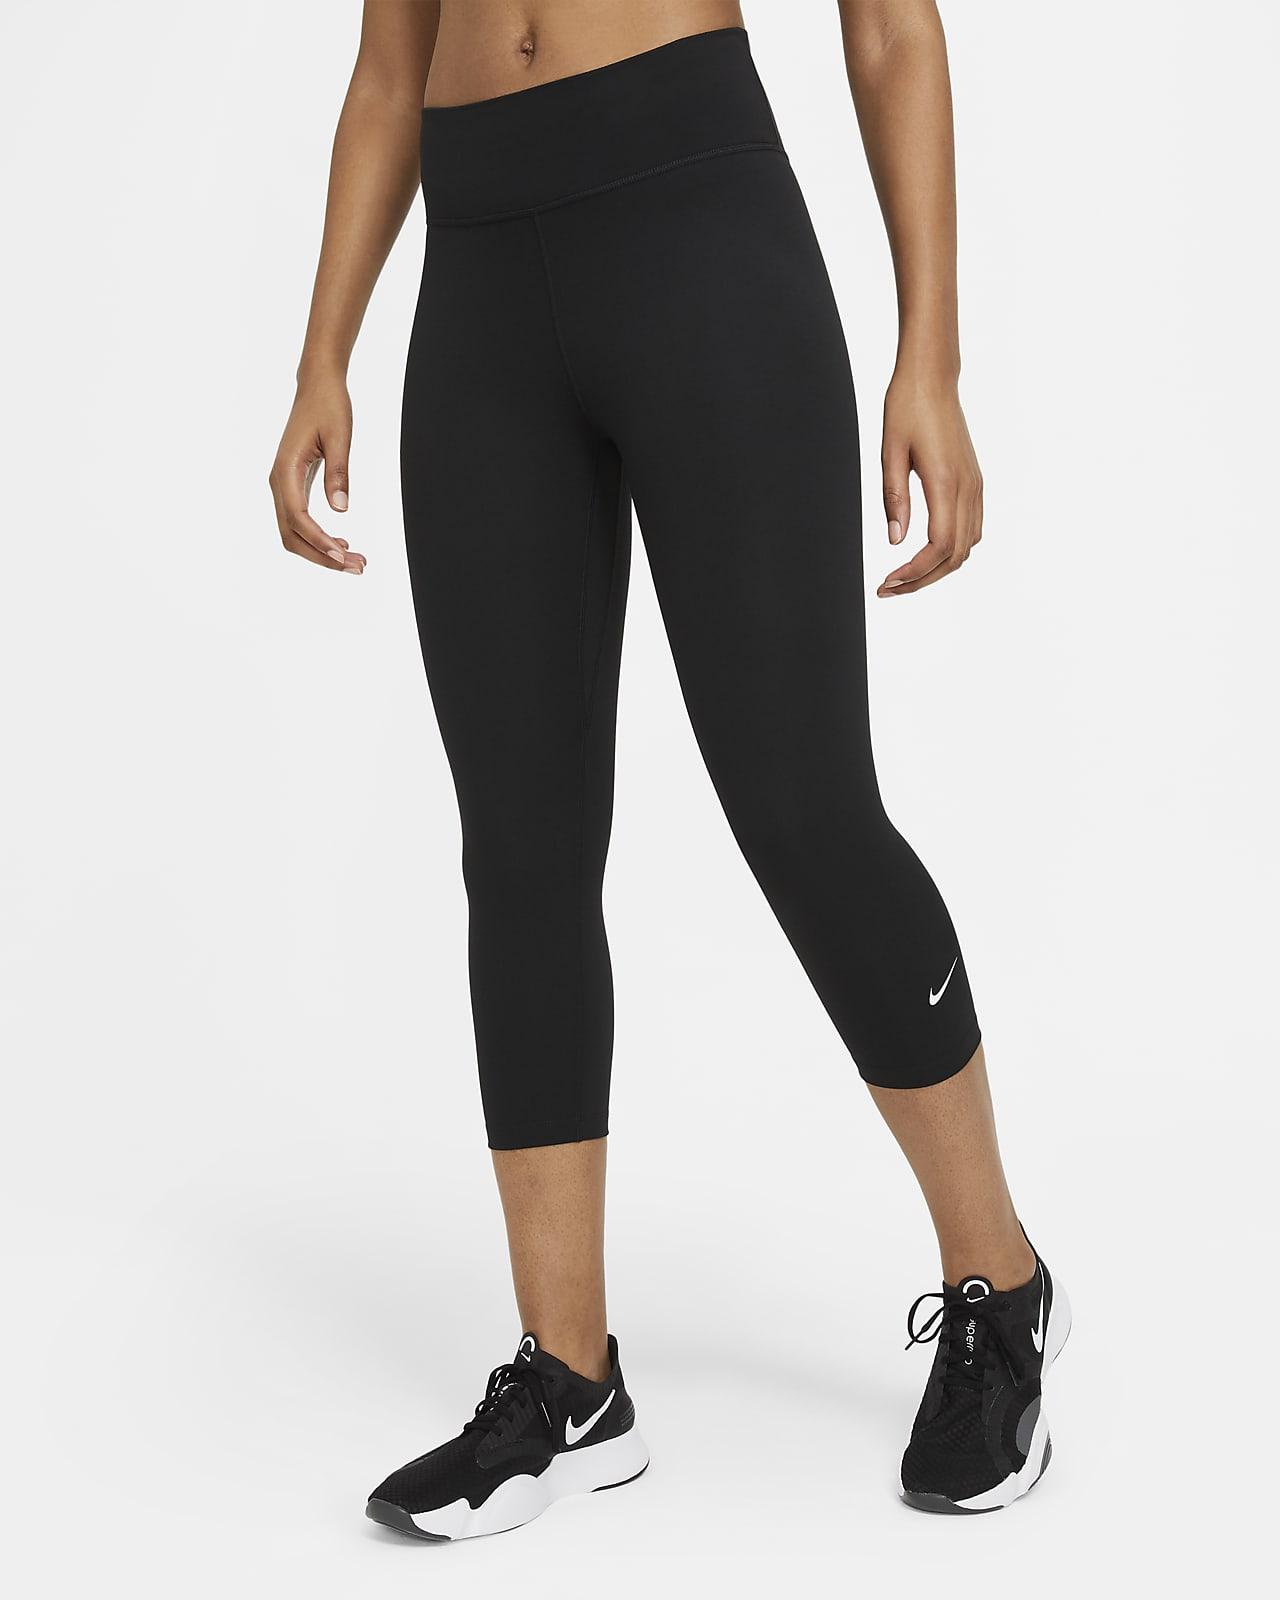 Nike One-capri-leggings med mellemhøj talje til kvinder